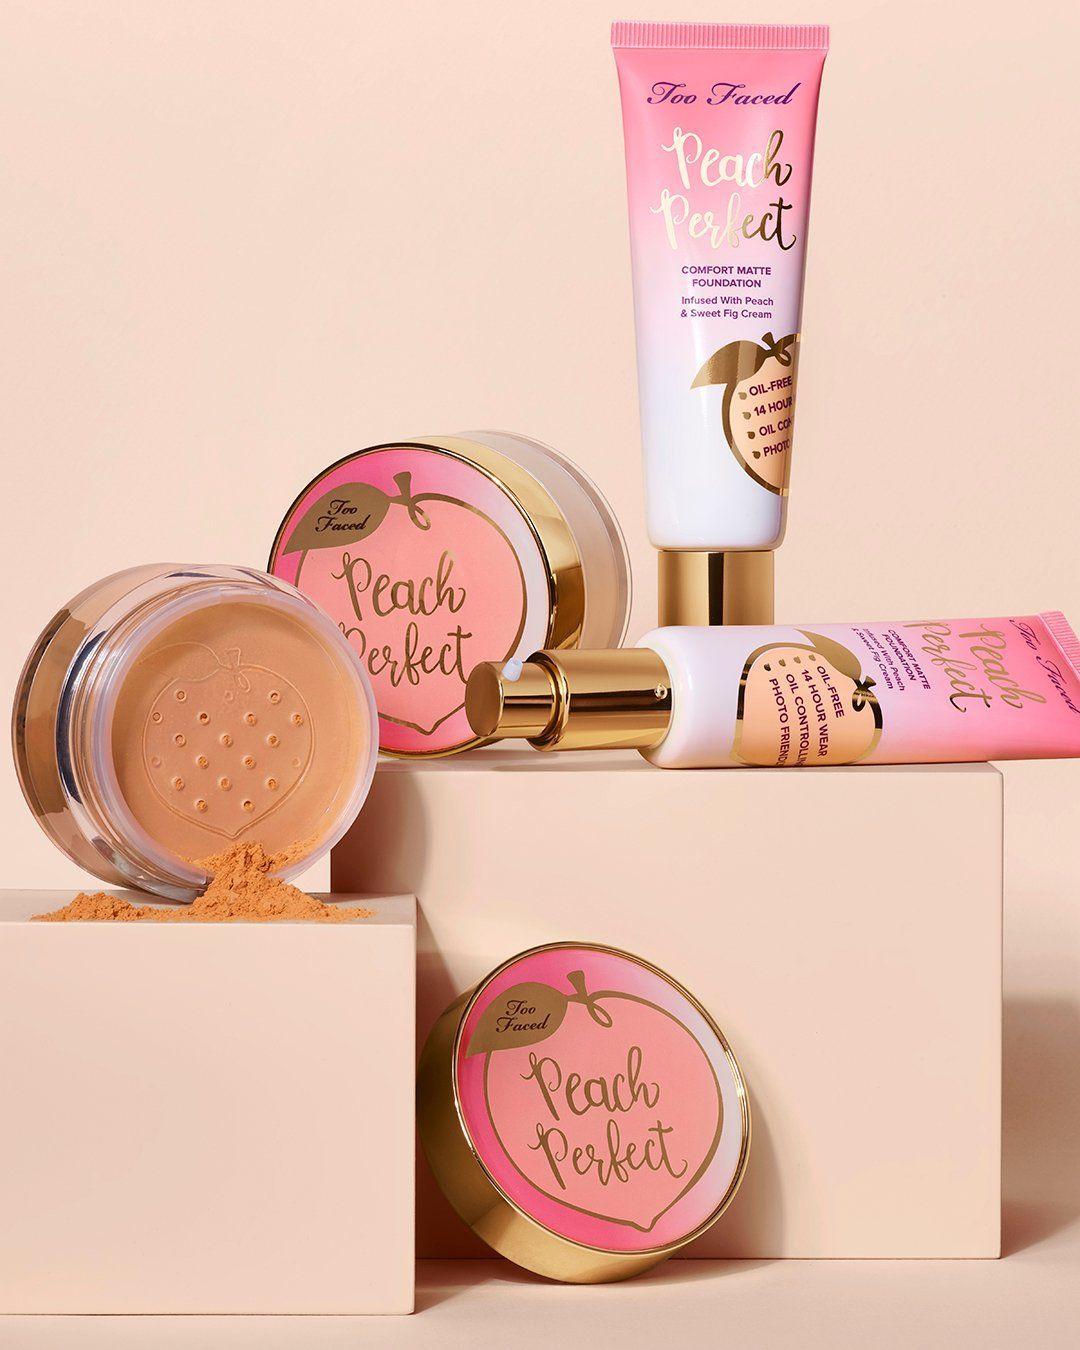 Too Faced Peaches und Cream Collection haben gerade neue